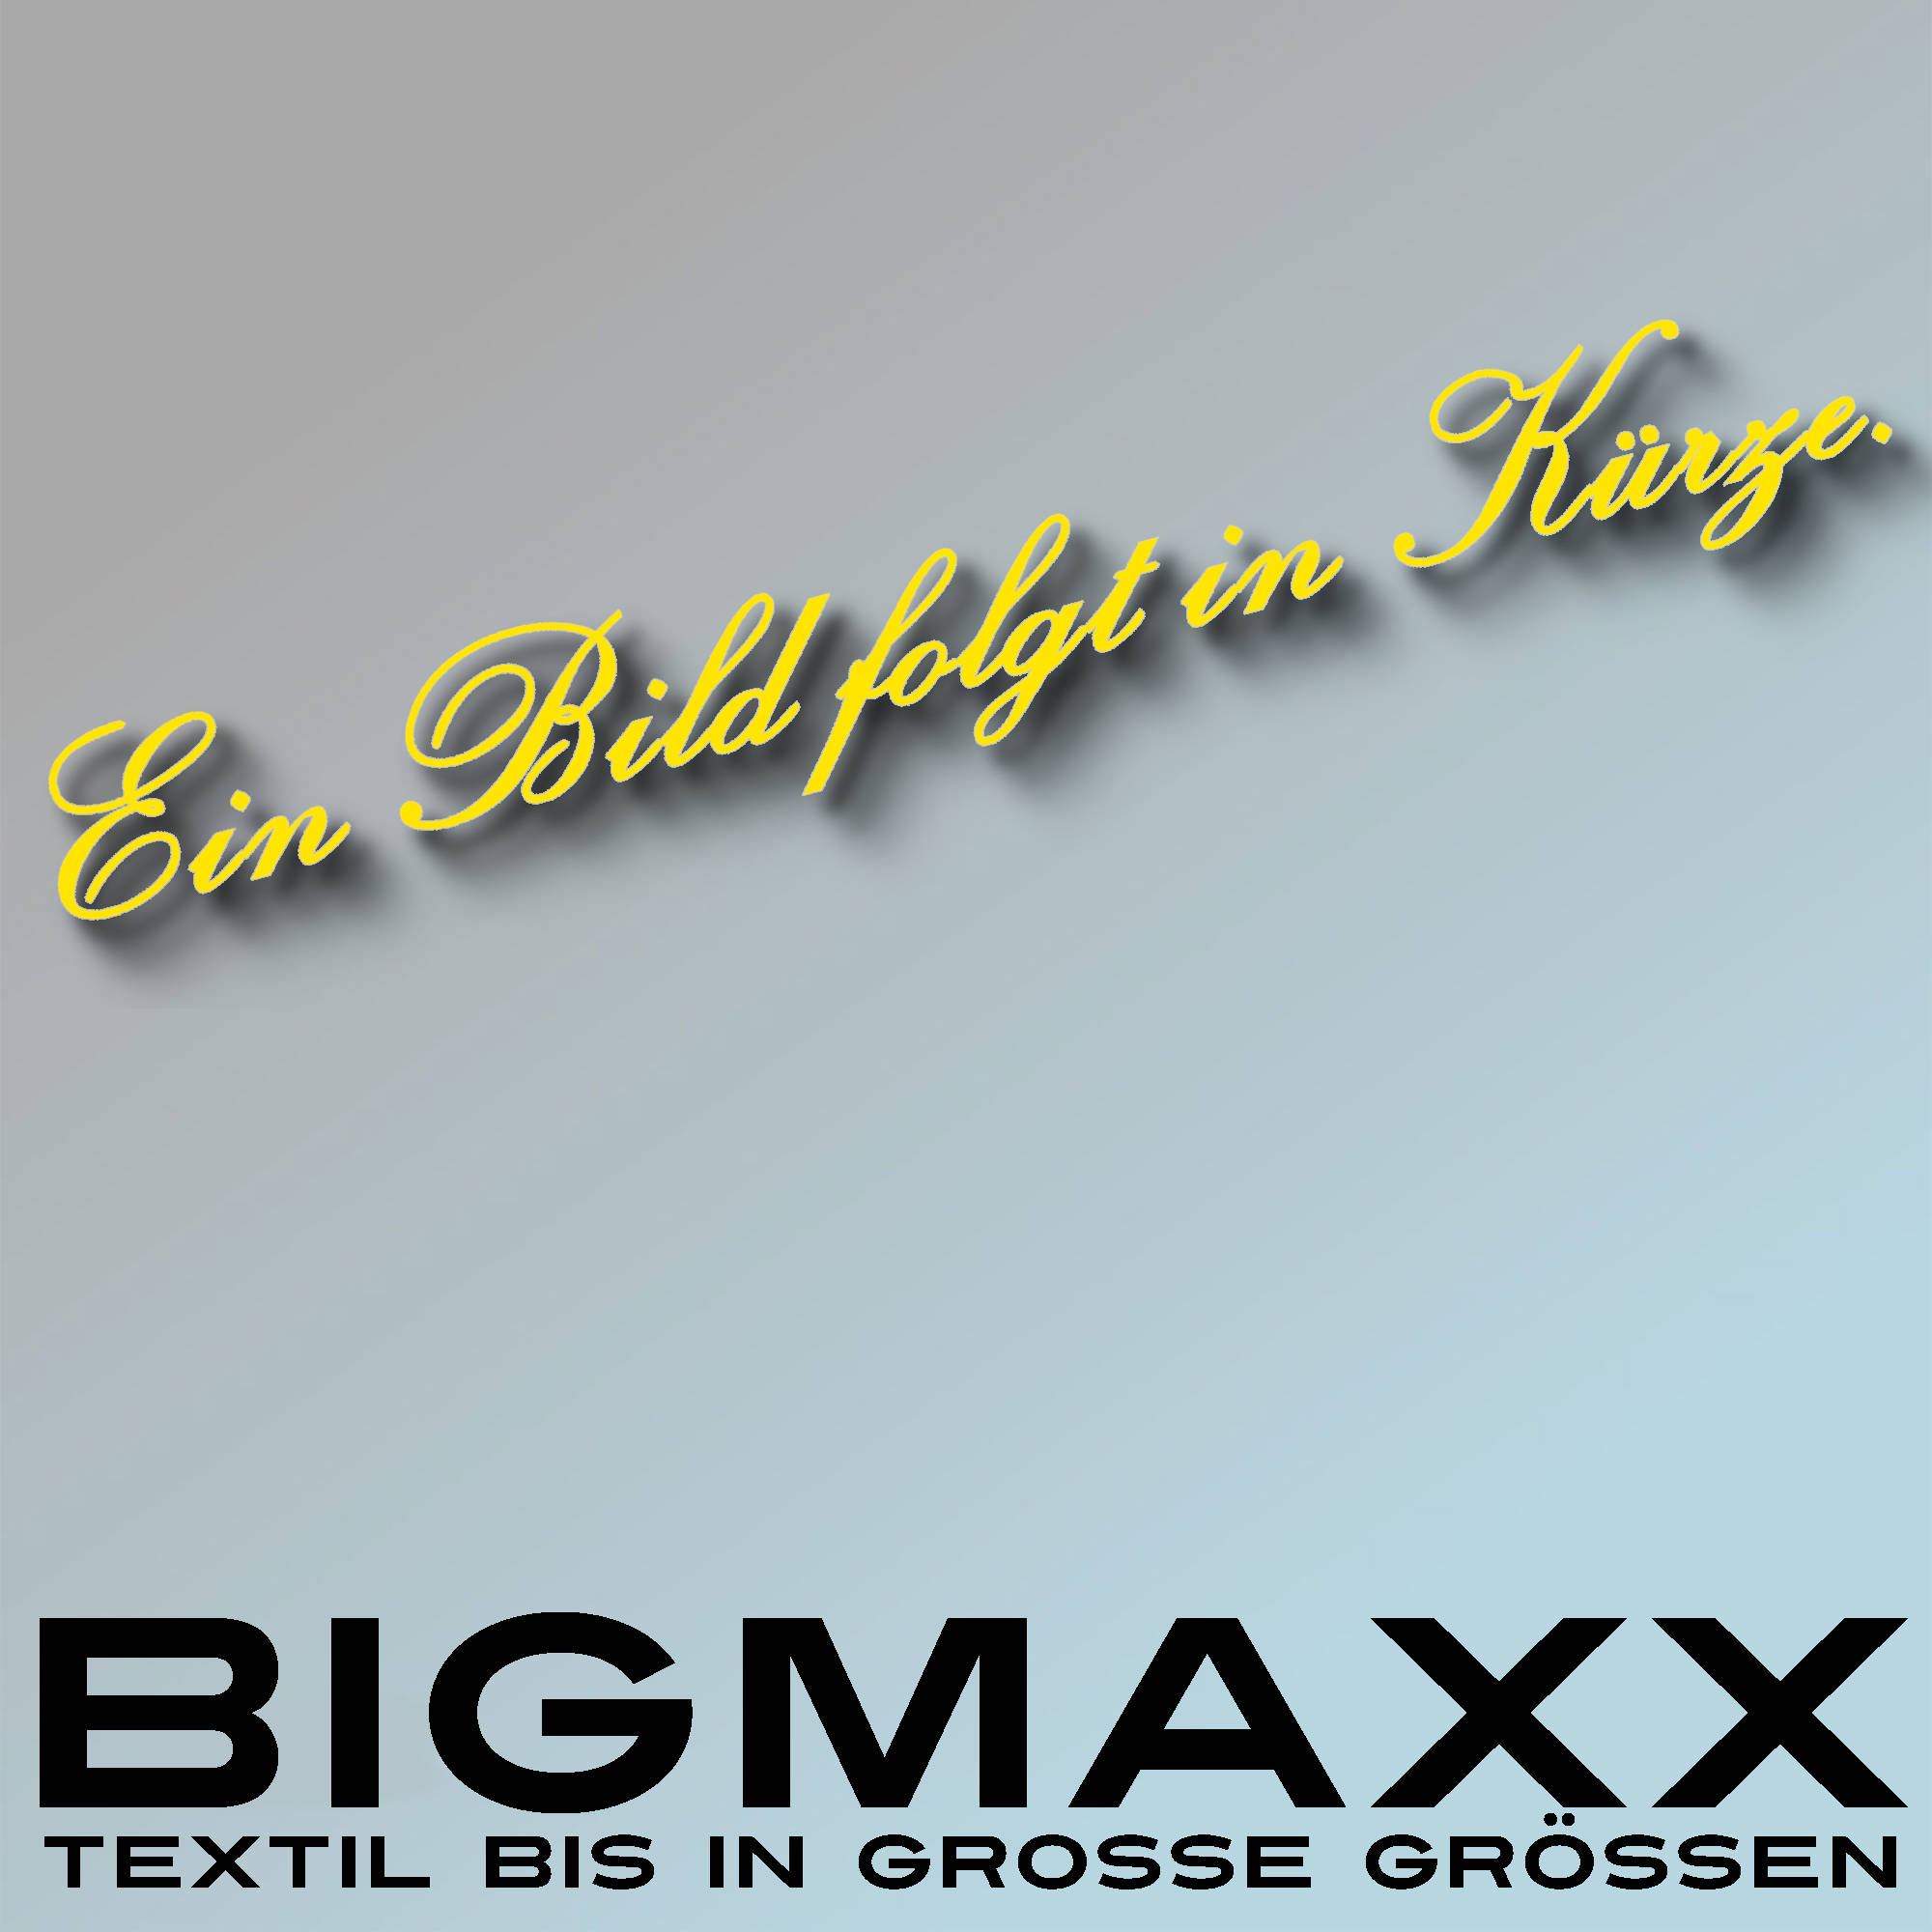 4PROtect Herren Wetterschutzjacke DENVER Outdoorjacke Arbeitsjacke in 3 Farben S bis 3XL